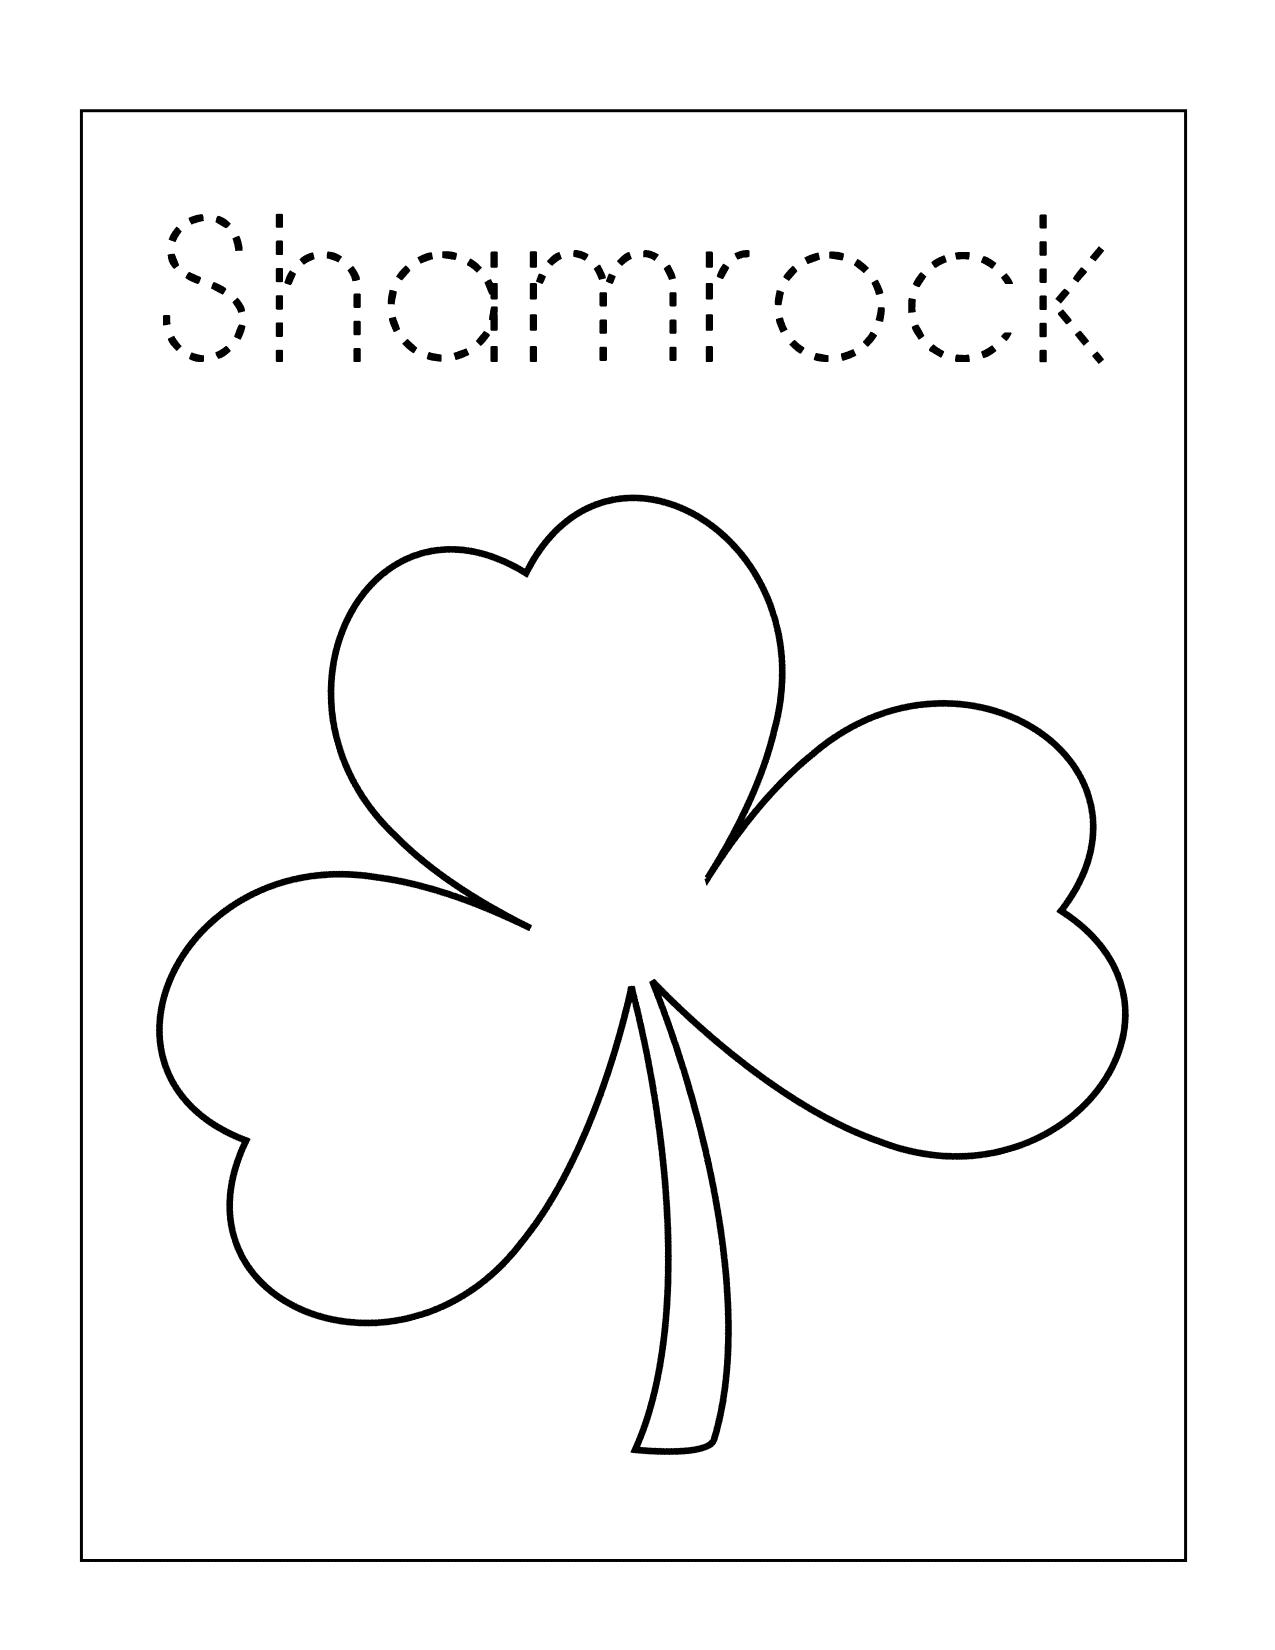 Shamrock Spelling Sheet